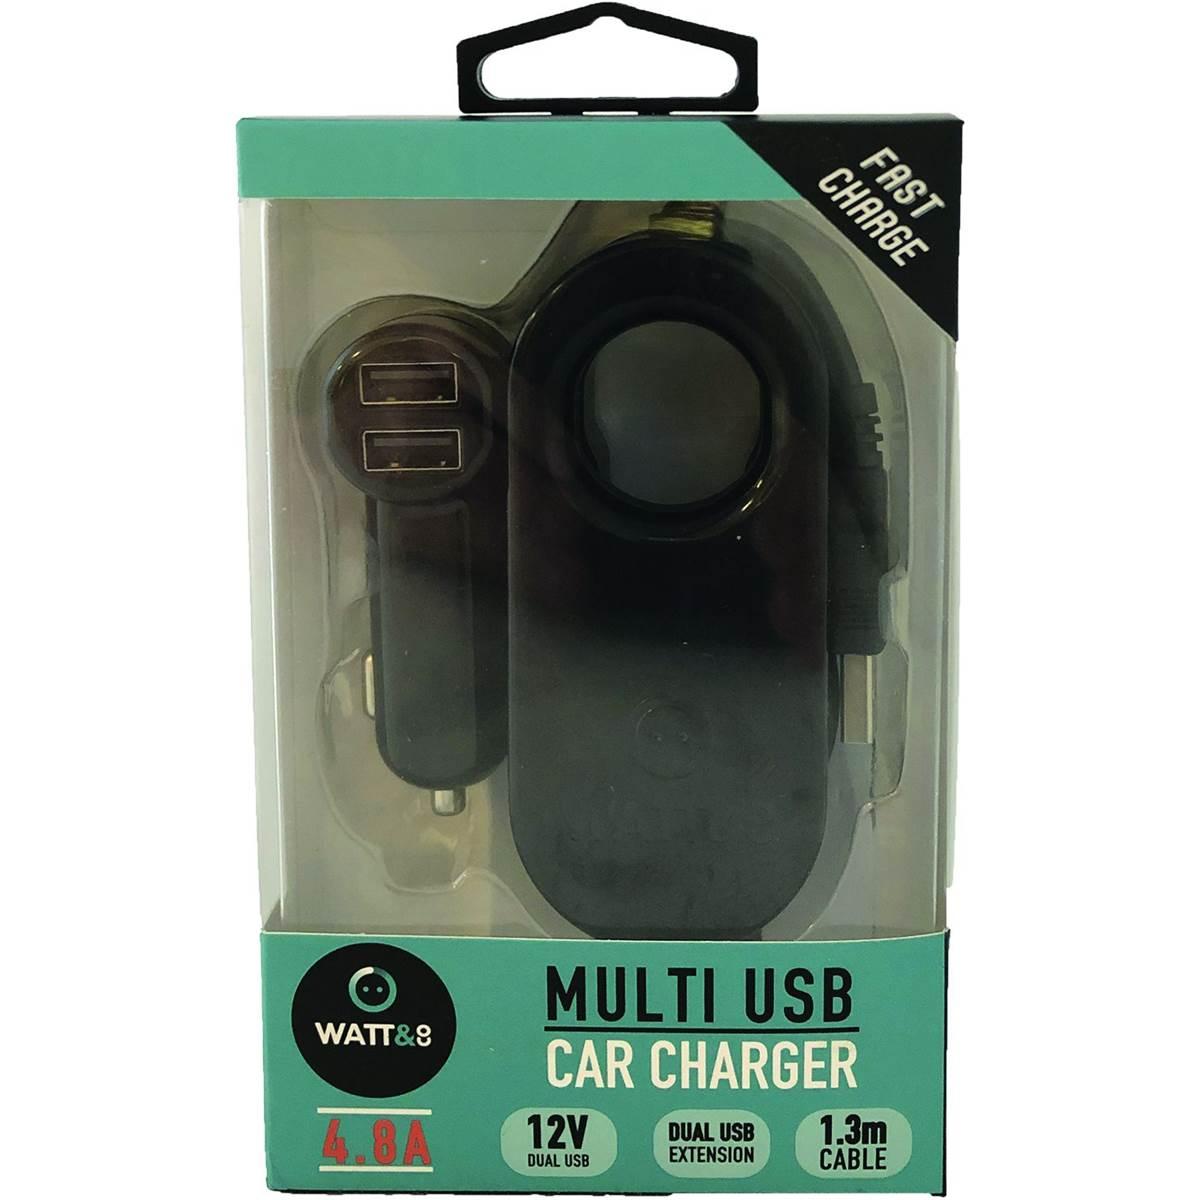 Chargeur allume cigare 2 entrées USB 4,8A + Hub 2 USB 4,8A Watt&Co